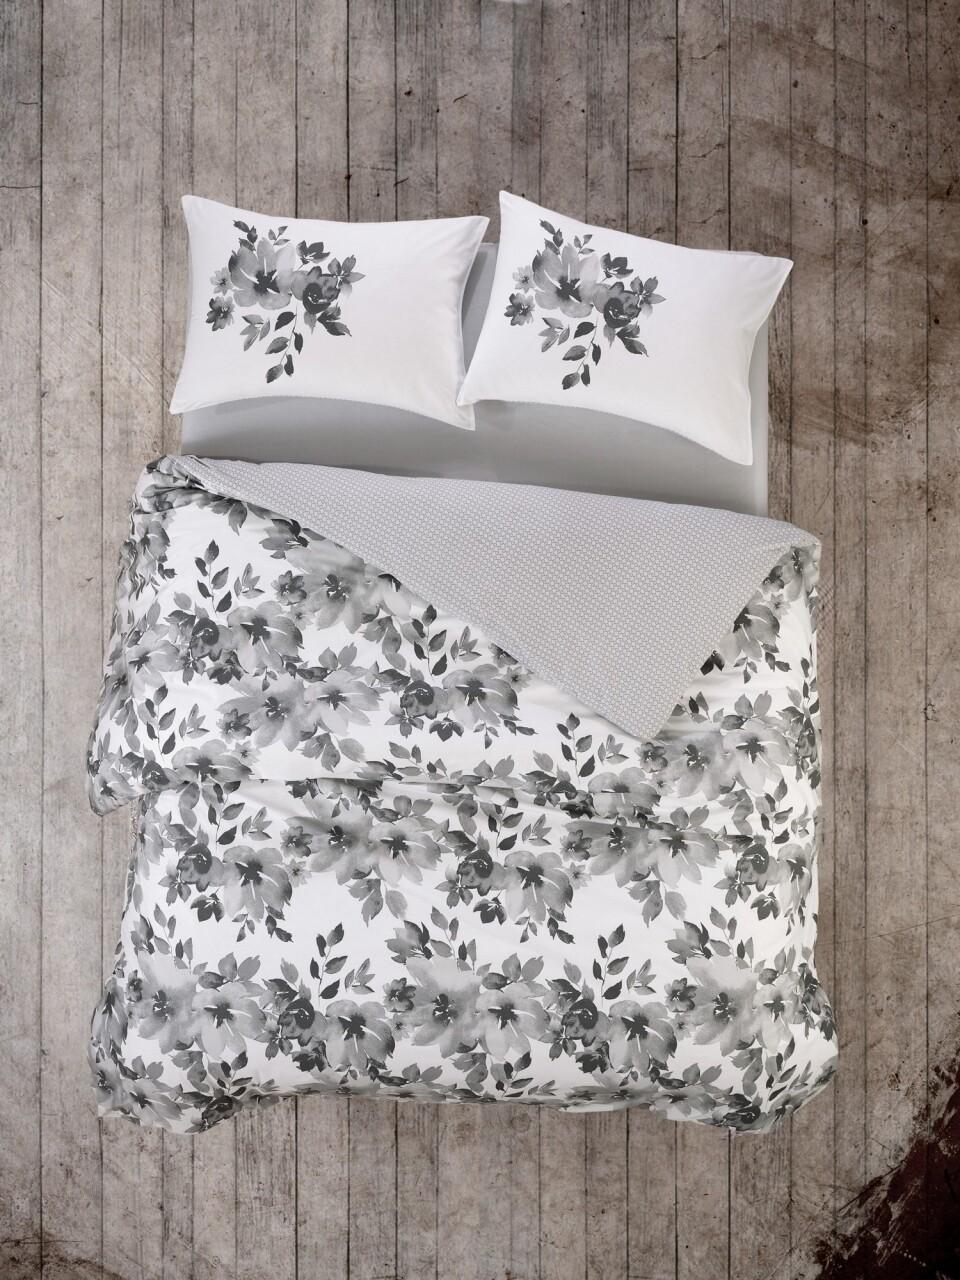 Lenjerie de pat matlasata pentru o persoana, 3 piese, 100% bumbac ranforce, Cotton Box, Volante Grey